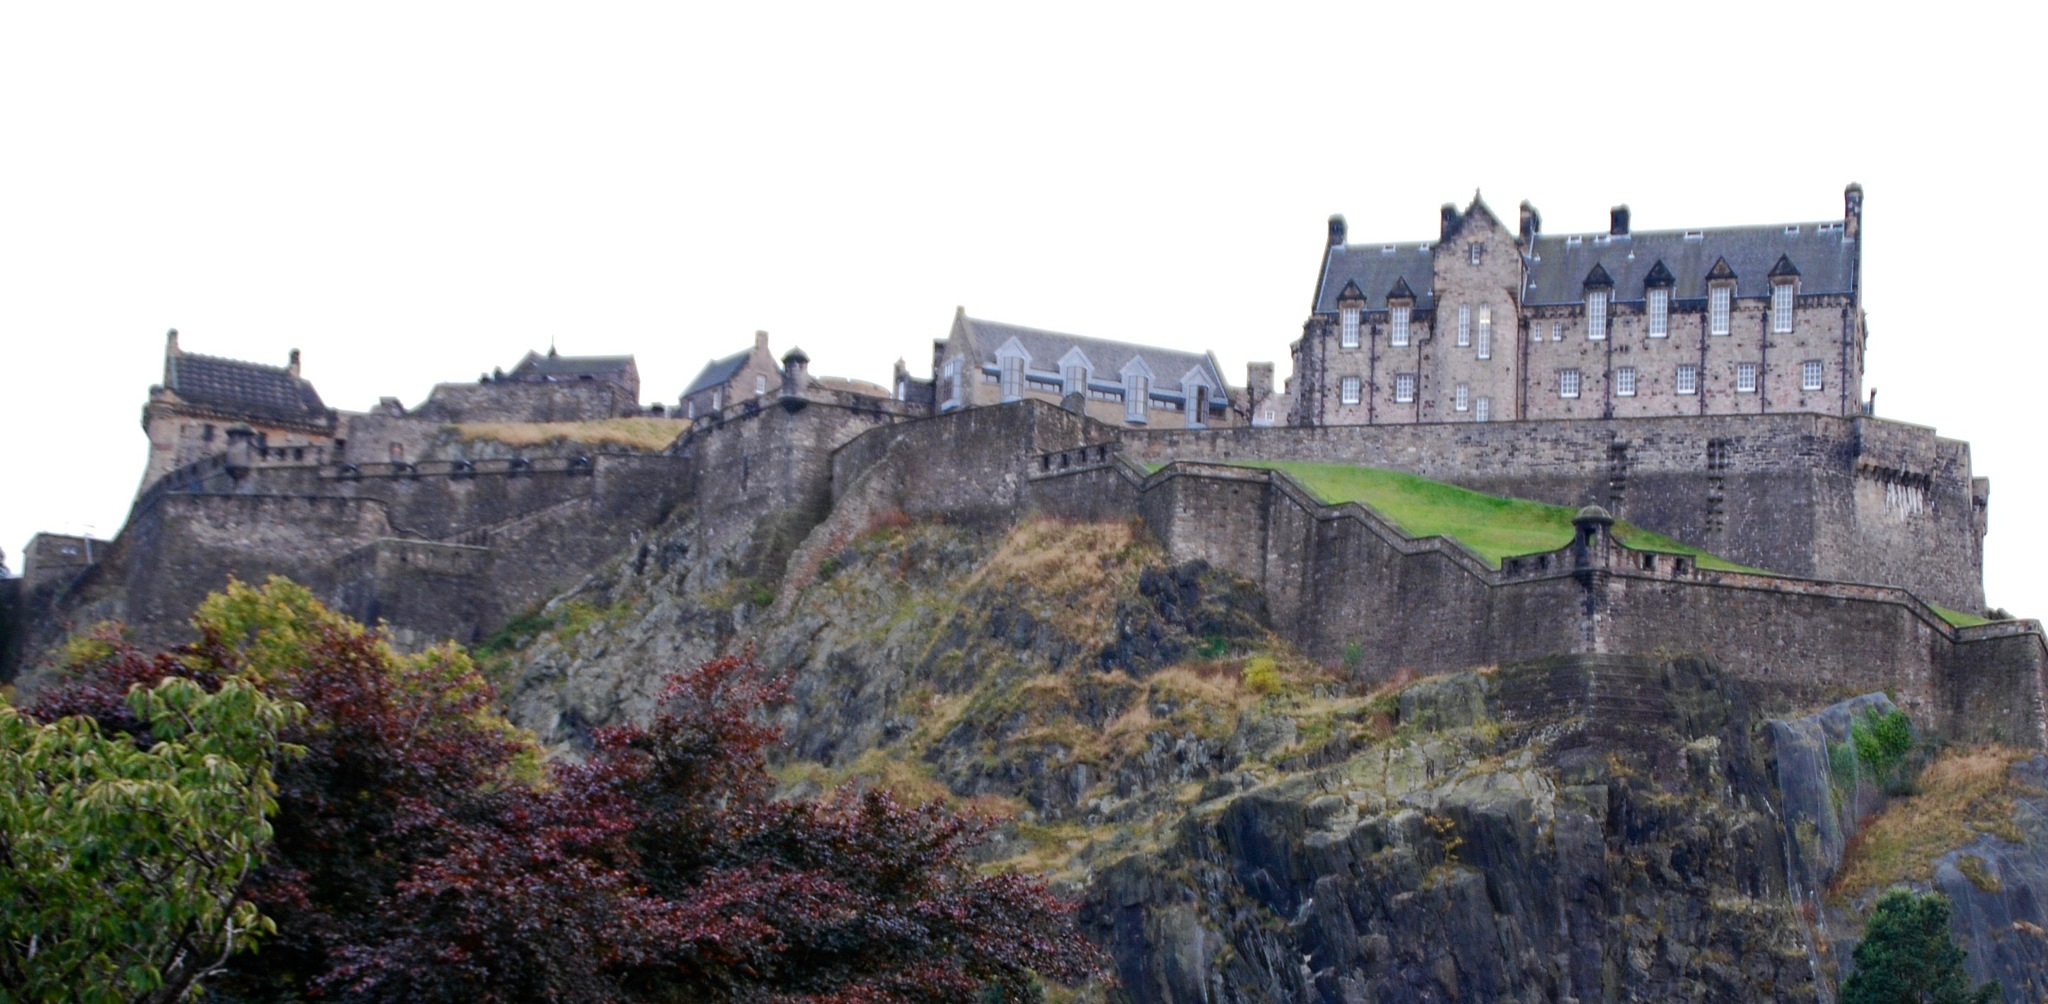 Edinburg Castle by Joe Lane